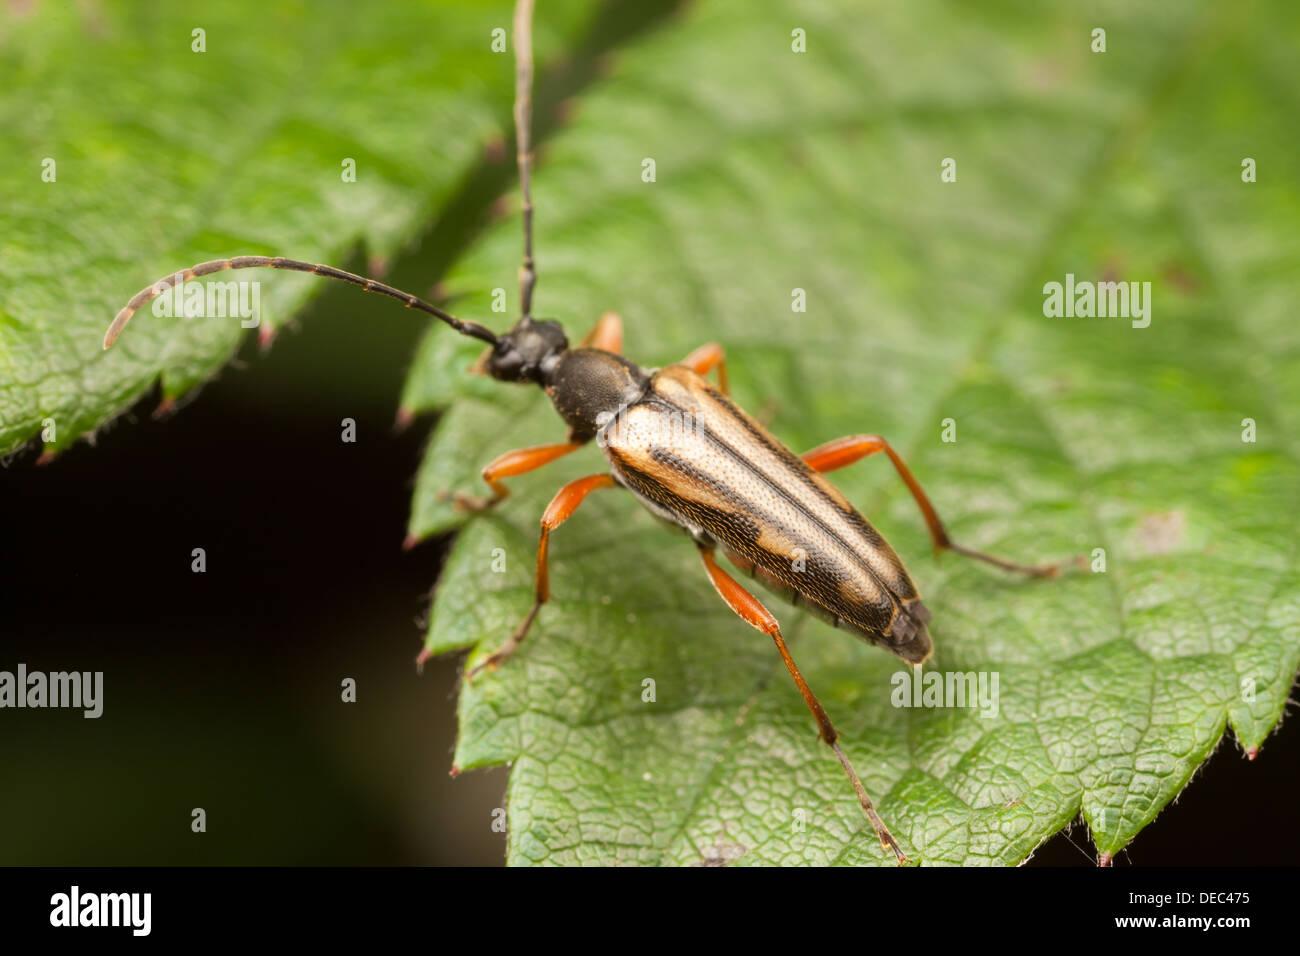 Asian Longhorned Beetle Life Cycle - Orkin.com